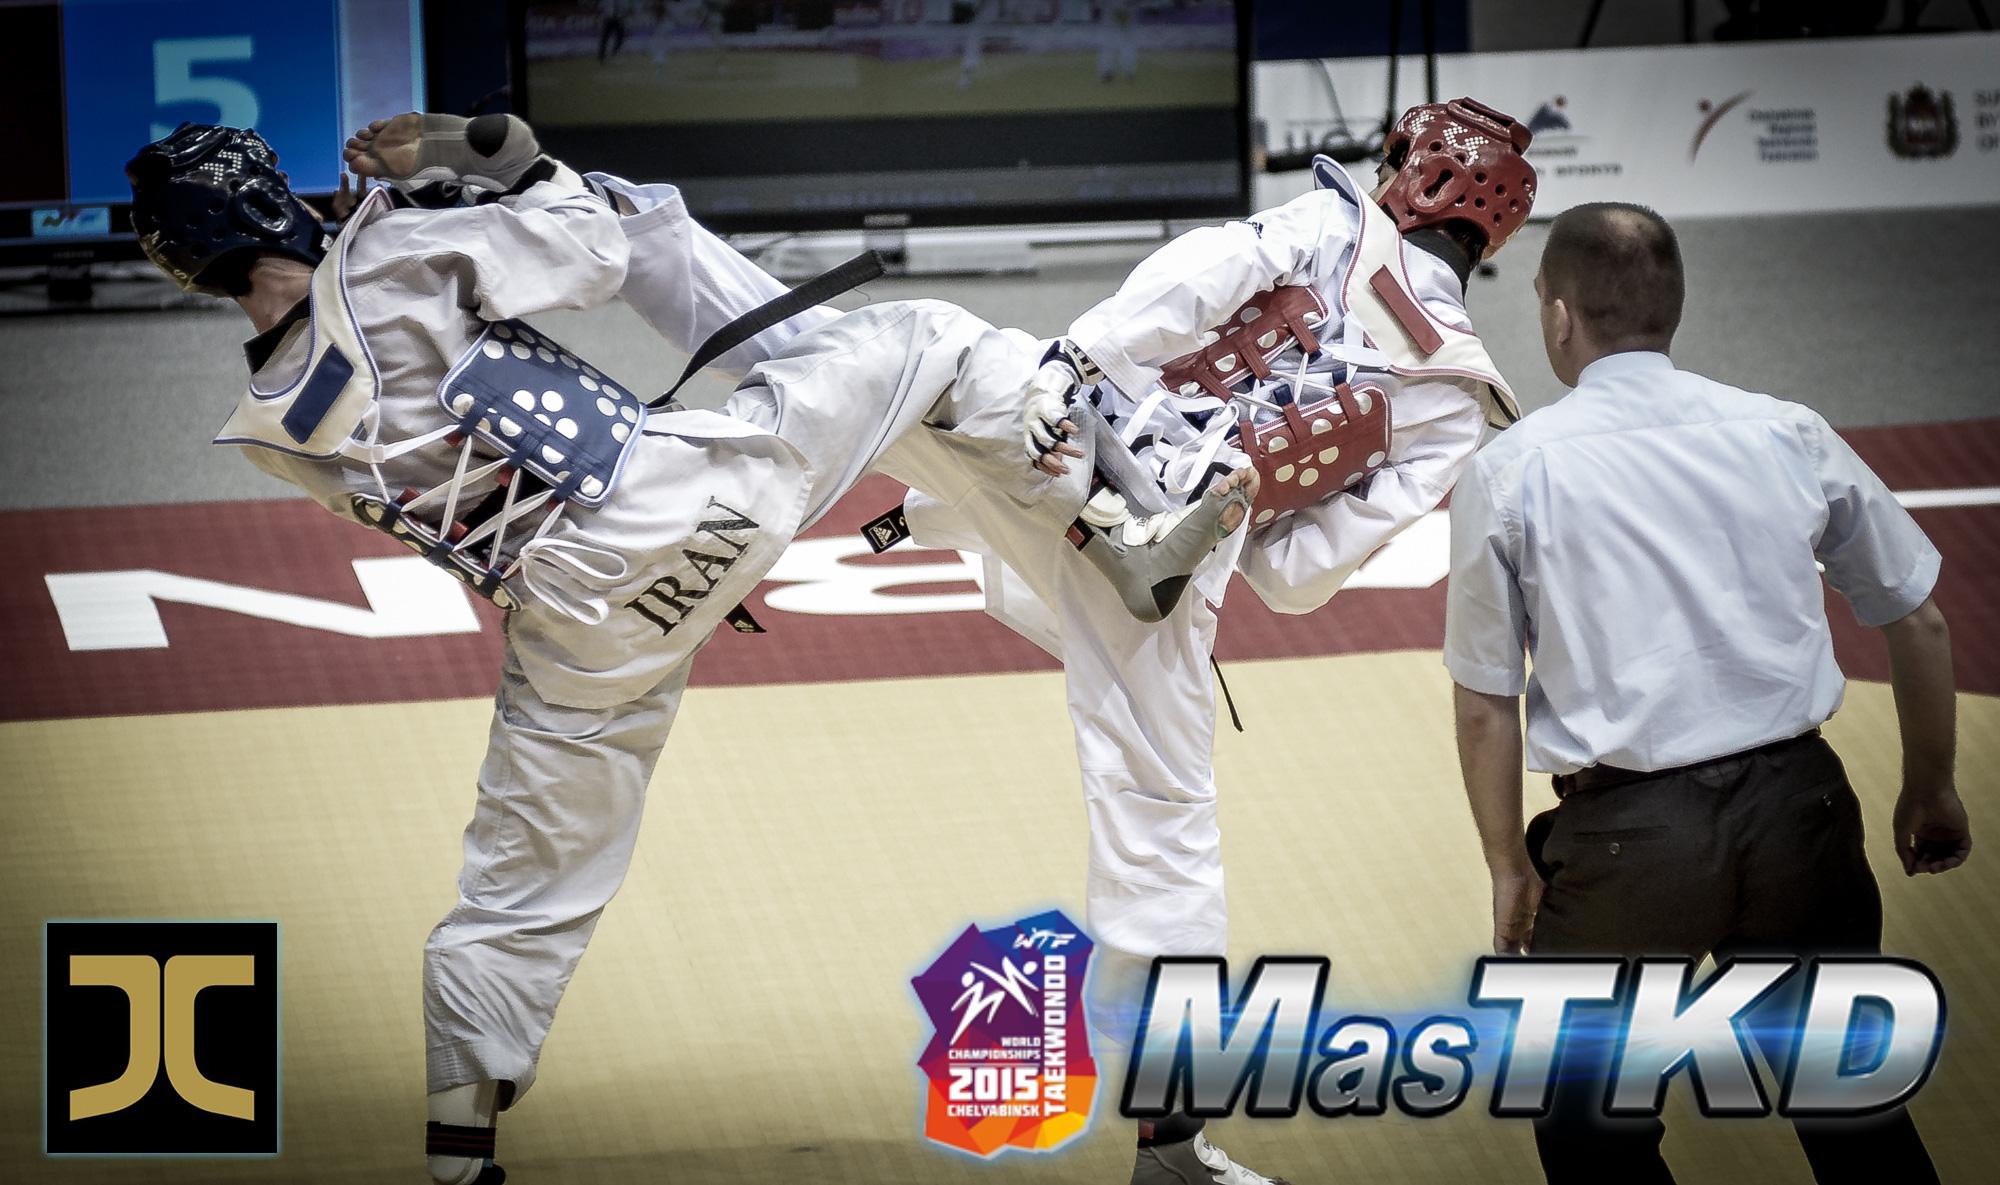 04_JCalicu-Mundial-Taekwondo-Mejores-Imagenes